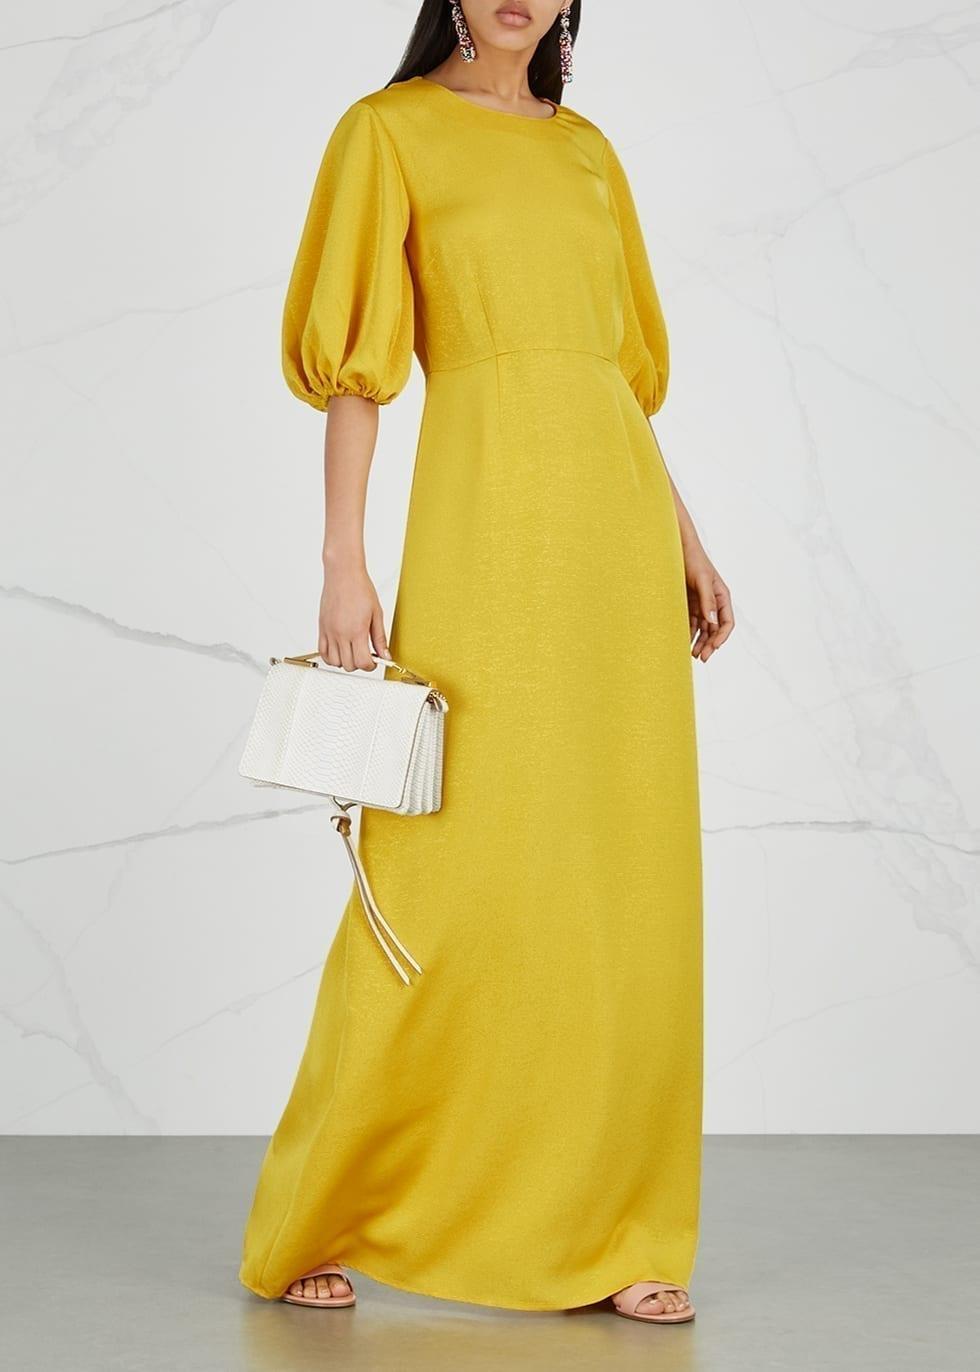 STINE GOYA Delia Ribbed Maxi Yellow Dress